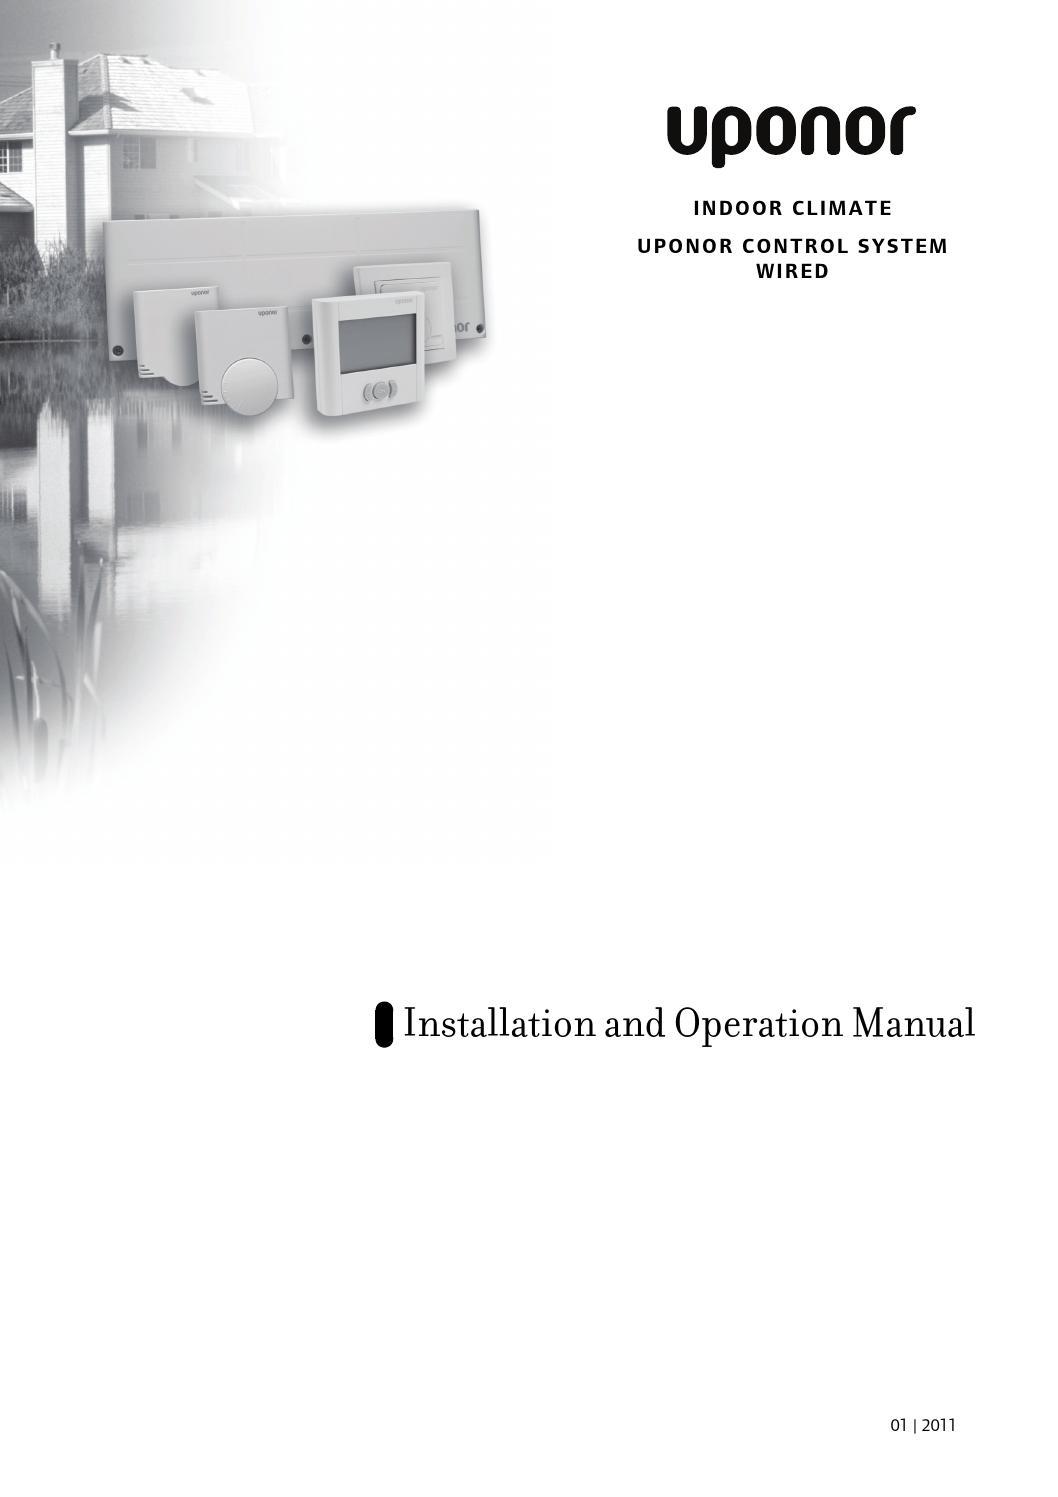 Mi ucs wired manual 01 2011 by Uponor International - issuu | Wirsbo Underfloor Heating Wiring Diagram |  | Issuu